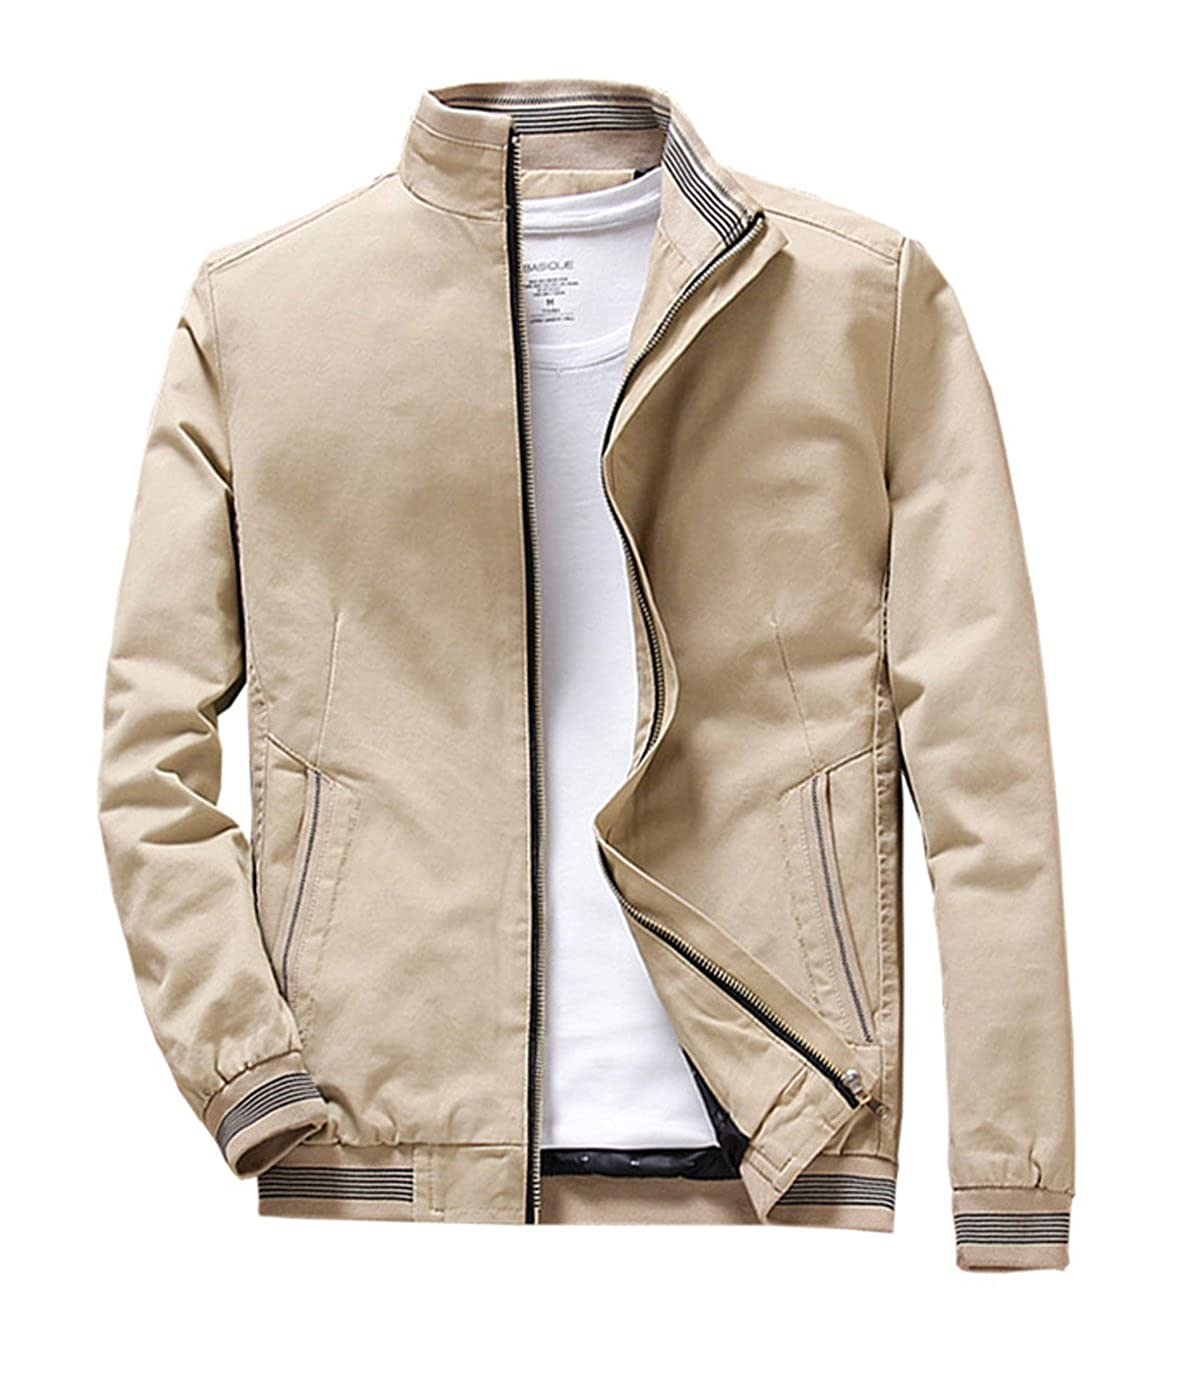 Nothar Mens Stand Collar Cotton Coat Outerwear, Front Zip Jacket